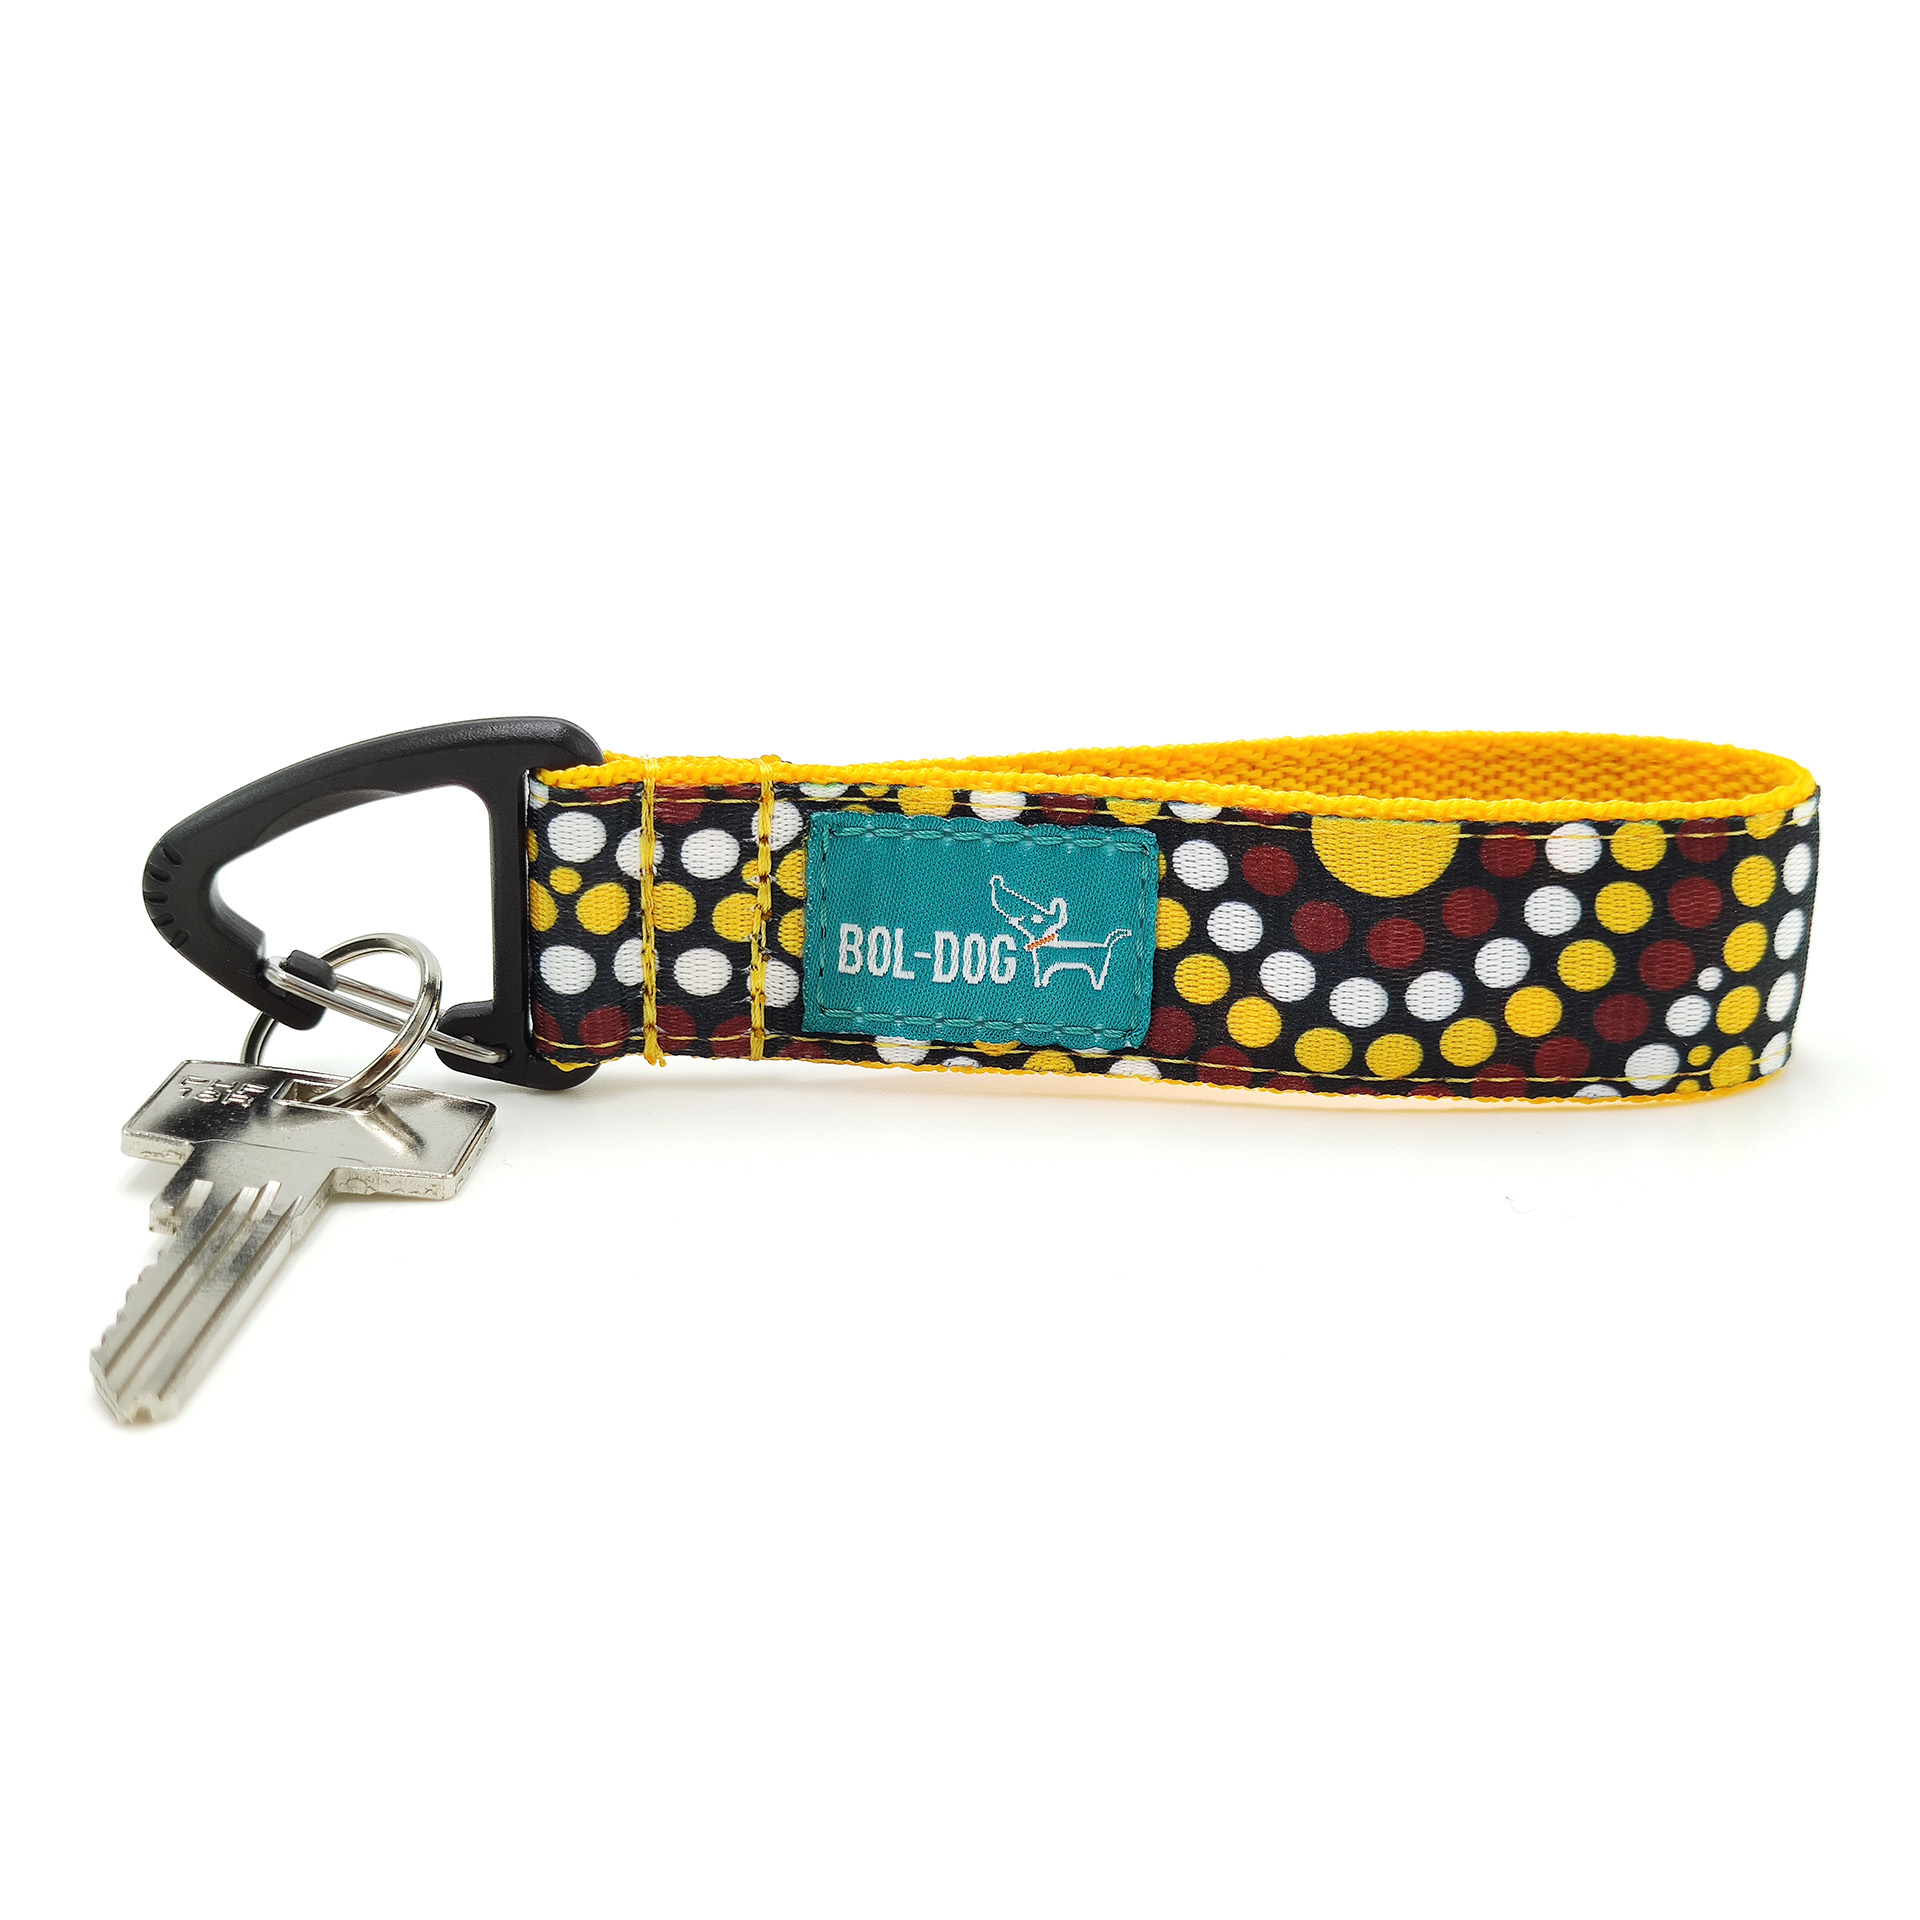 Ishihara key holder